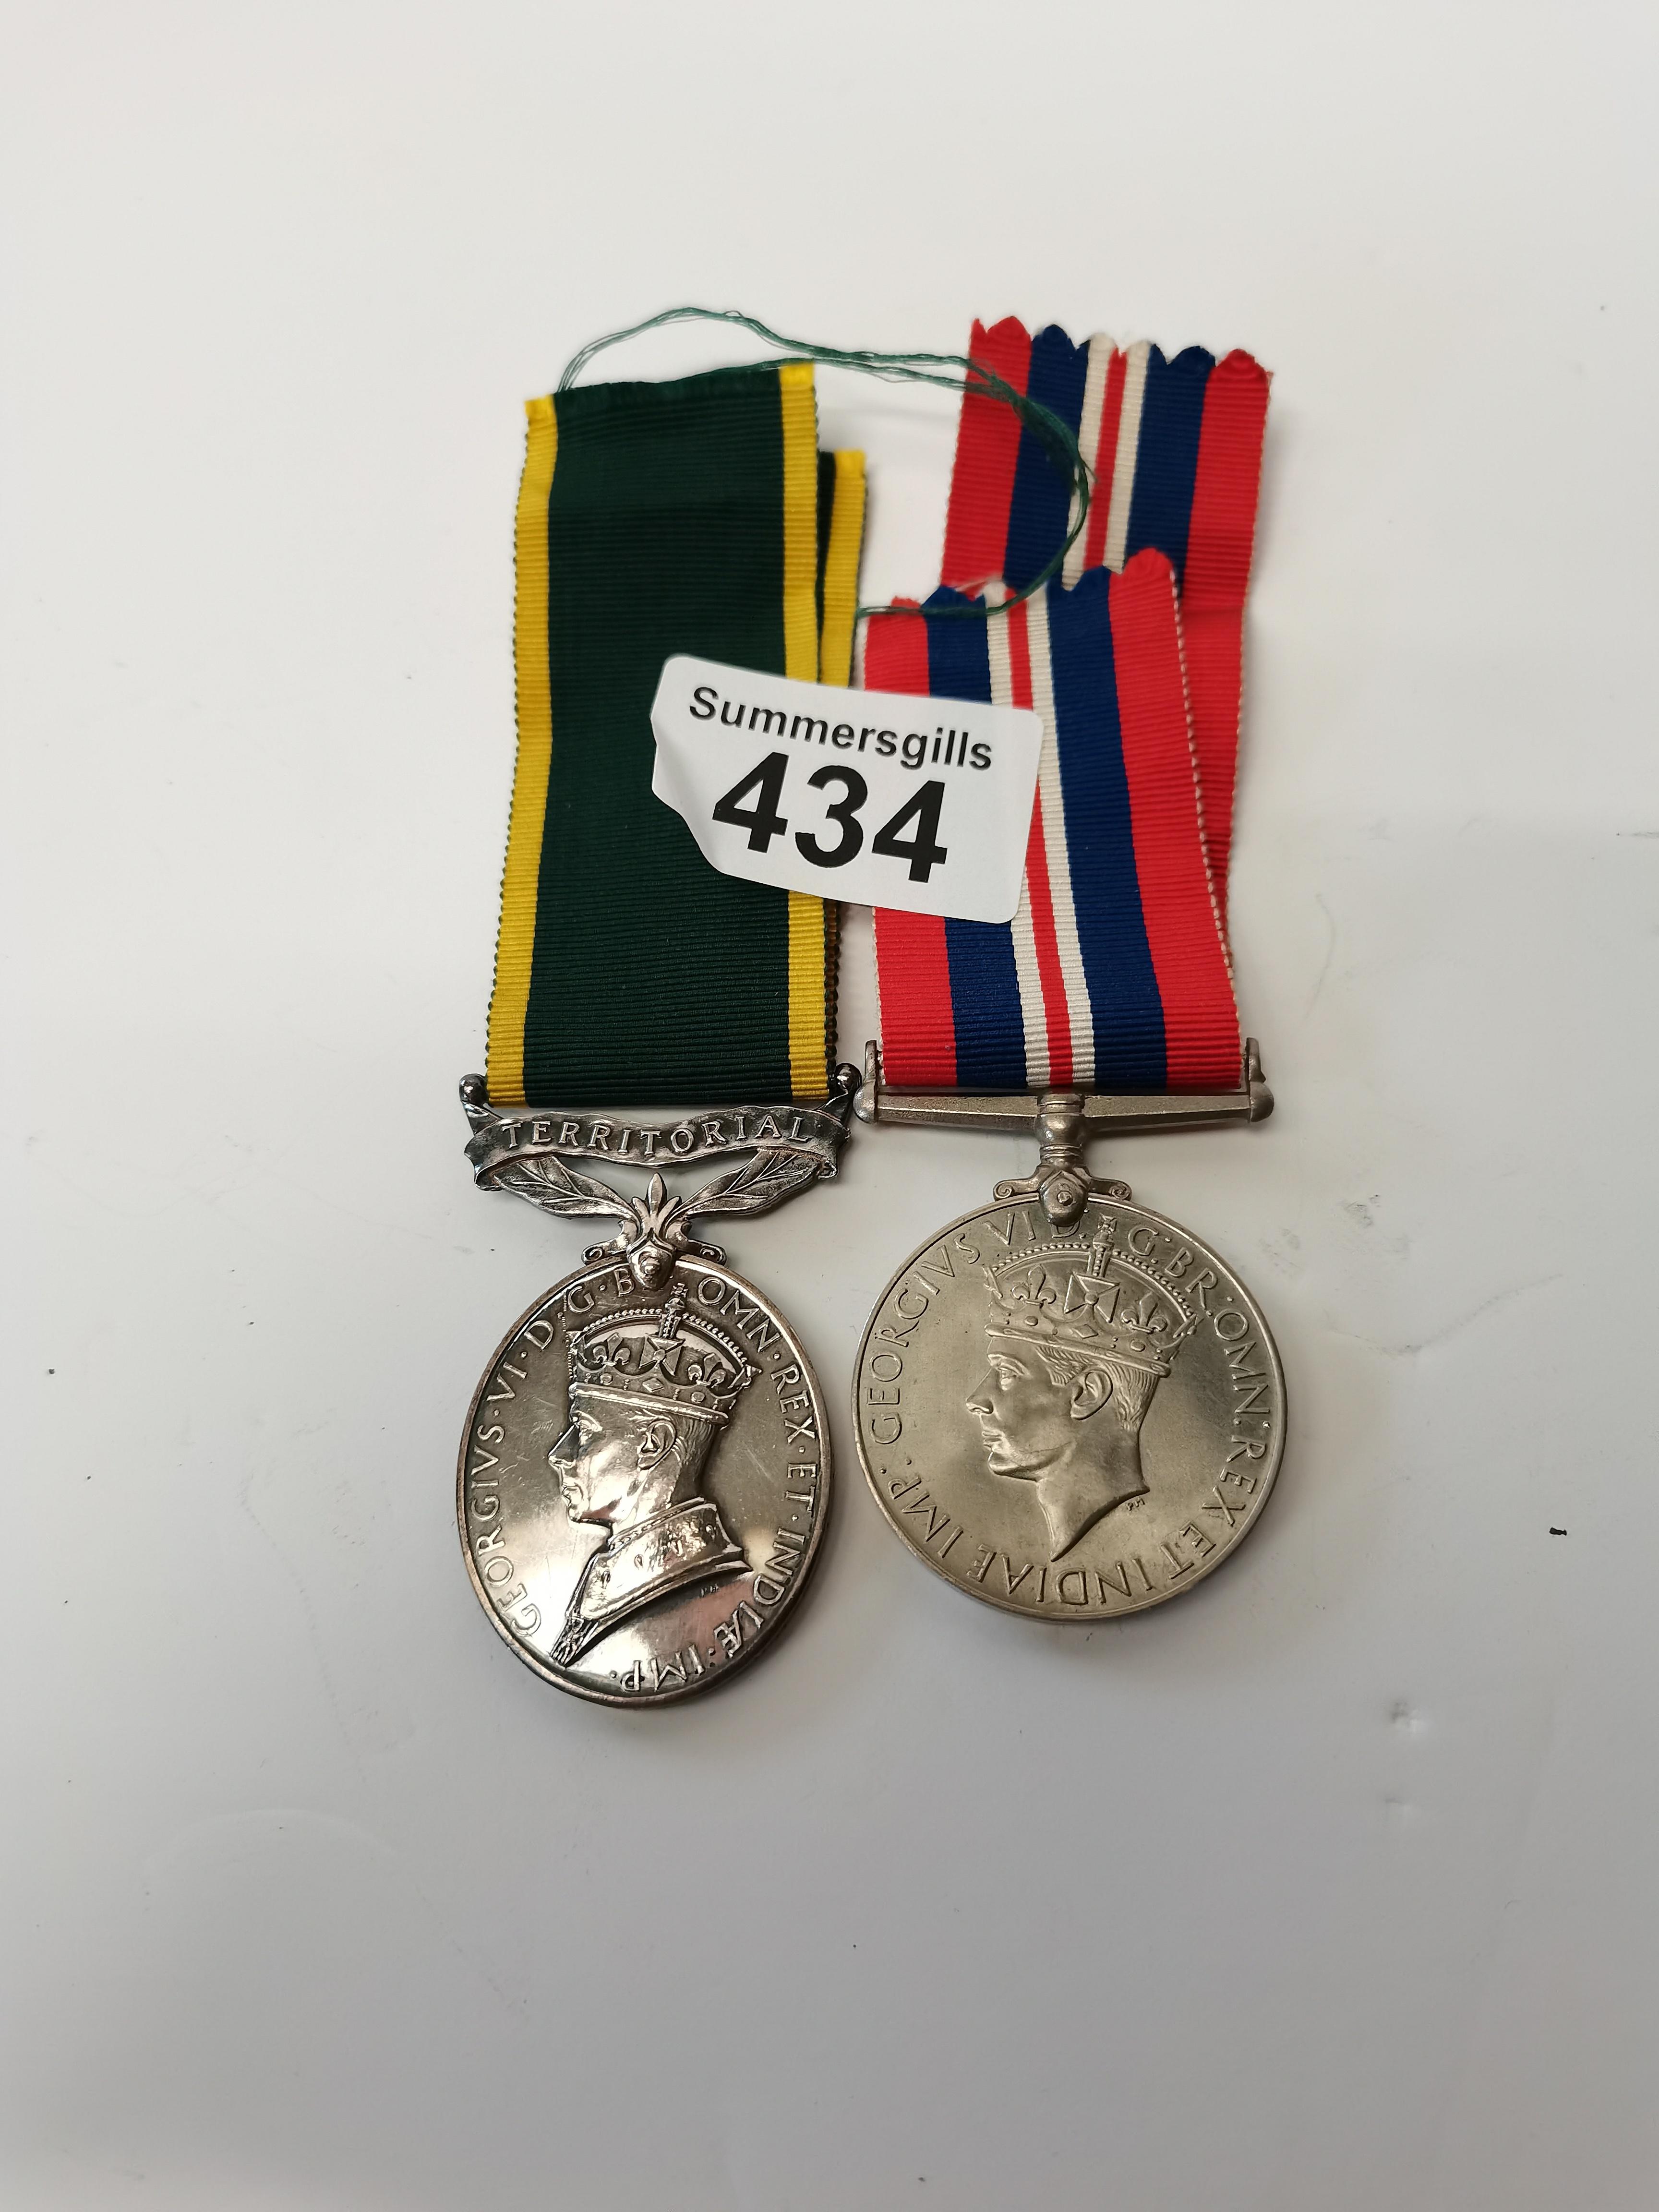 War medal 1939-45 and territorial medal 910872 BDR KM HUNTER RA